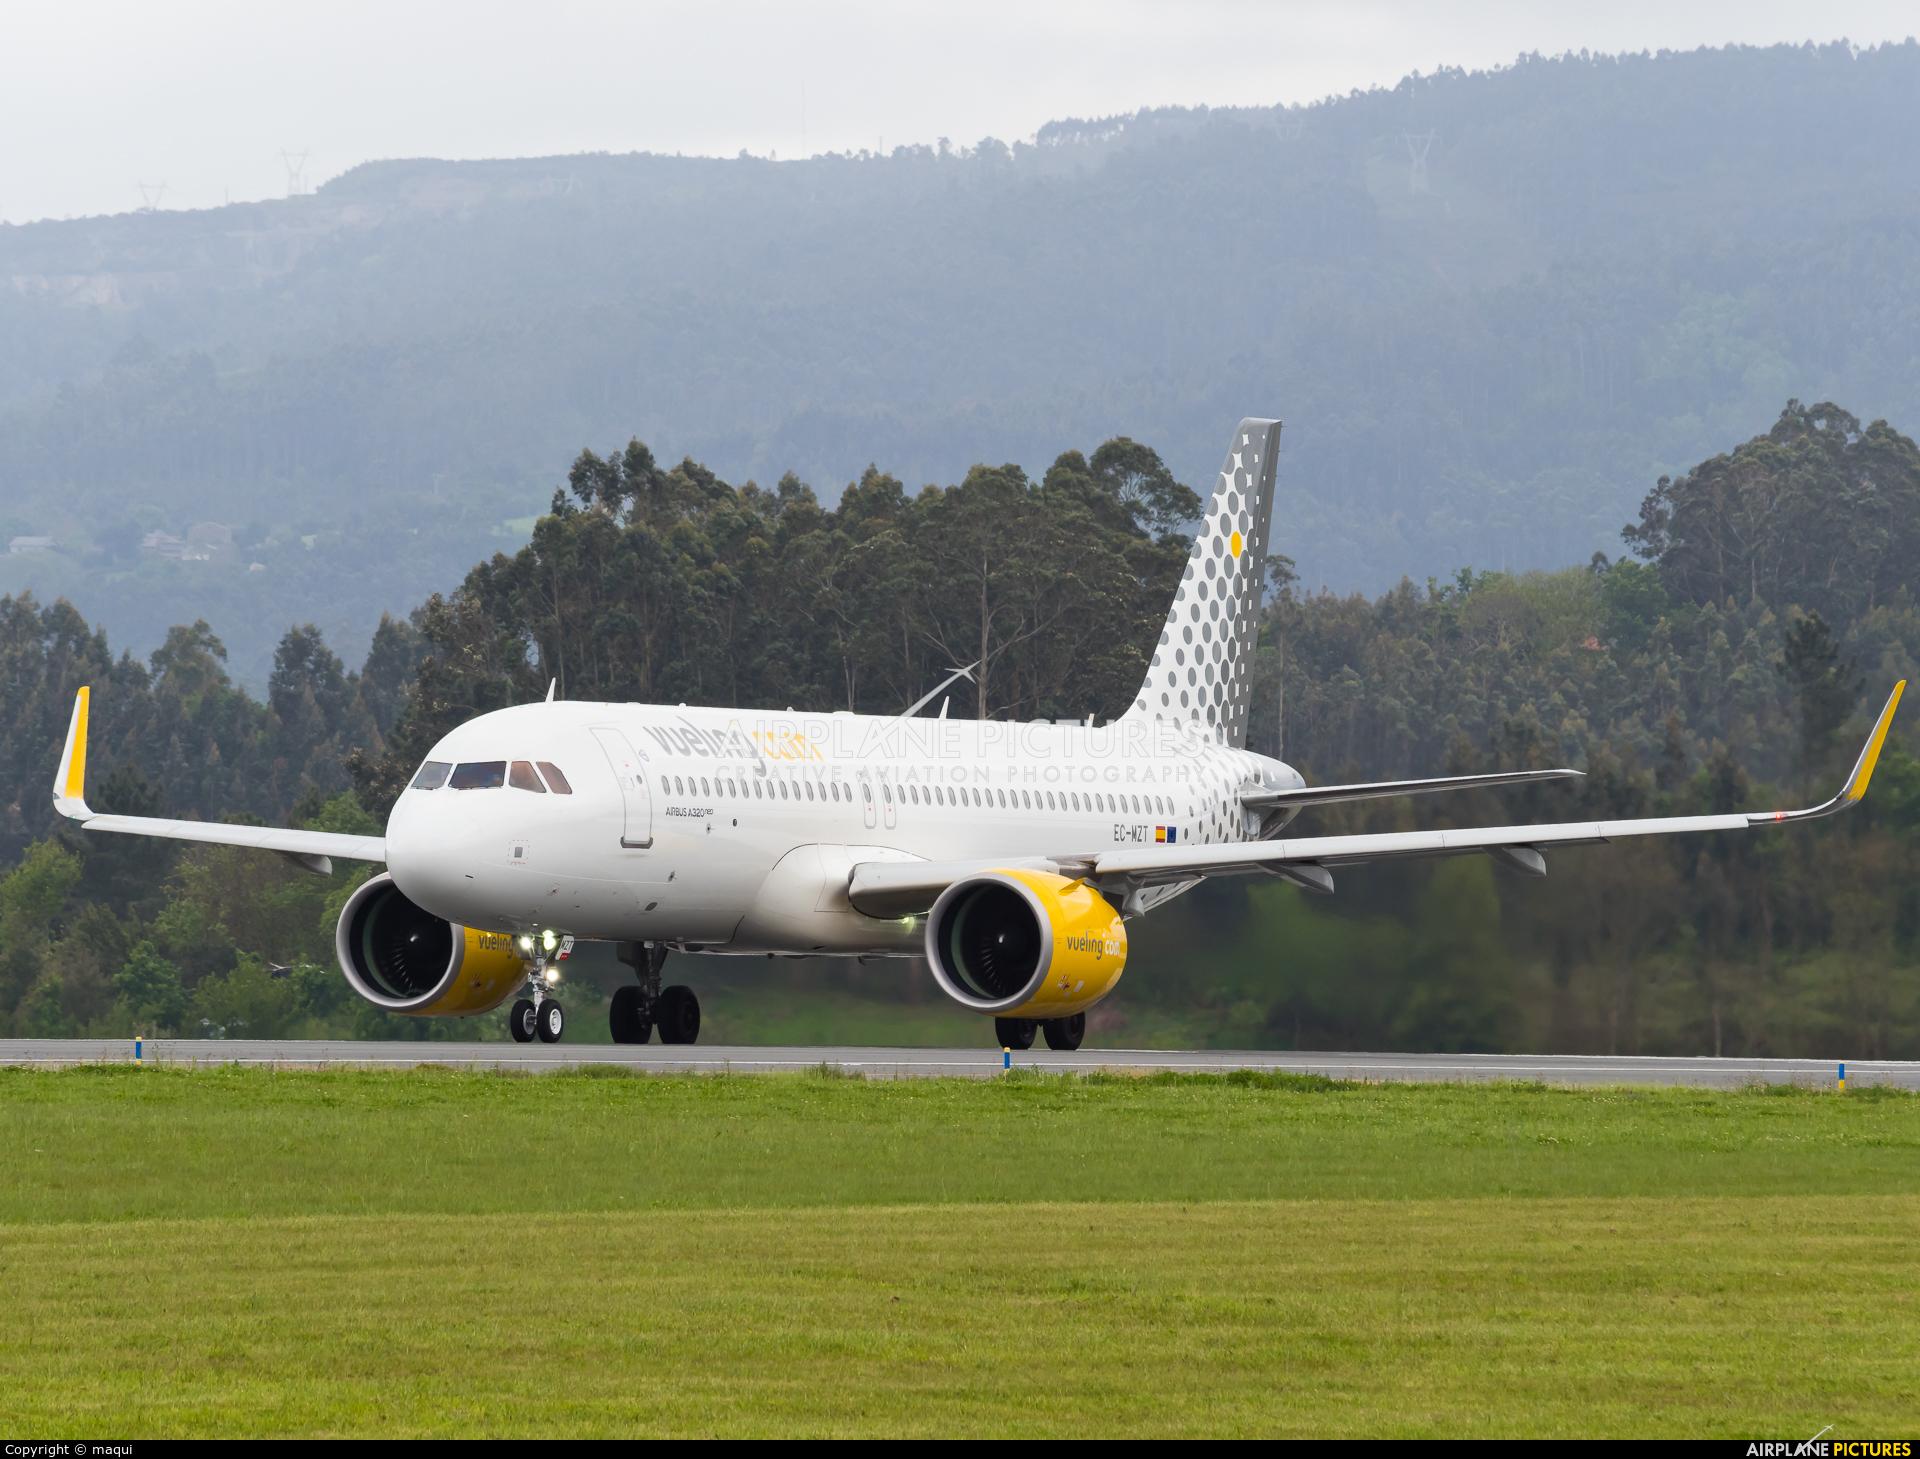 Vueling Airlines EC-MZT aircraft at La Coruña